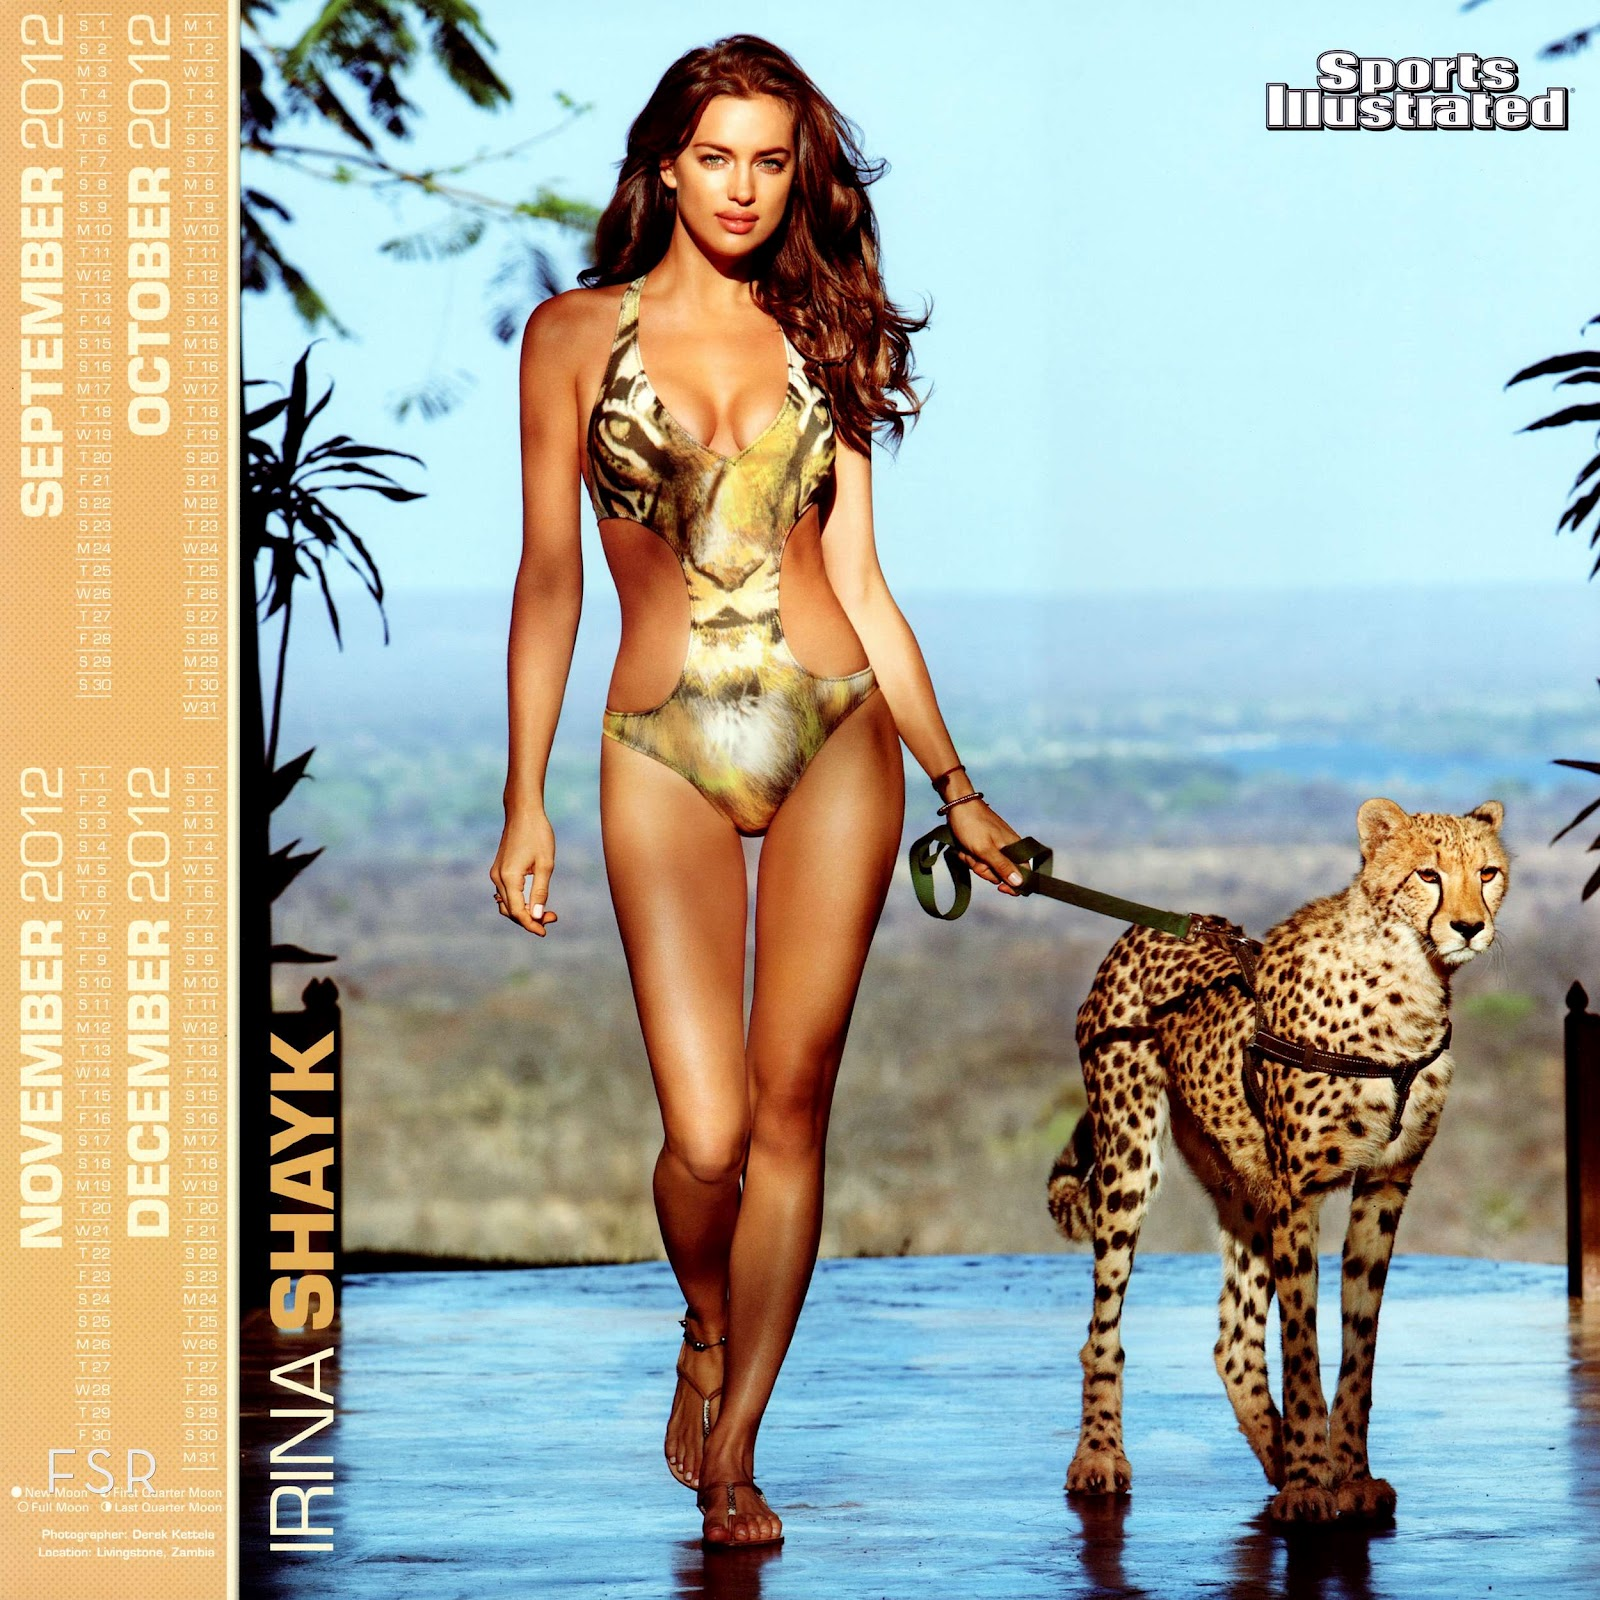 http://1.bp.blogspot.com/-3m_8iUhh3vk/UGX3xh4Tt8I/AAAAAAABBPo/eREBOFgePn4/s1600/Irina+Shayk+-+2013+Calendar+Sports+Illustrated+Swimsuit+-02.jpg